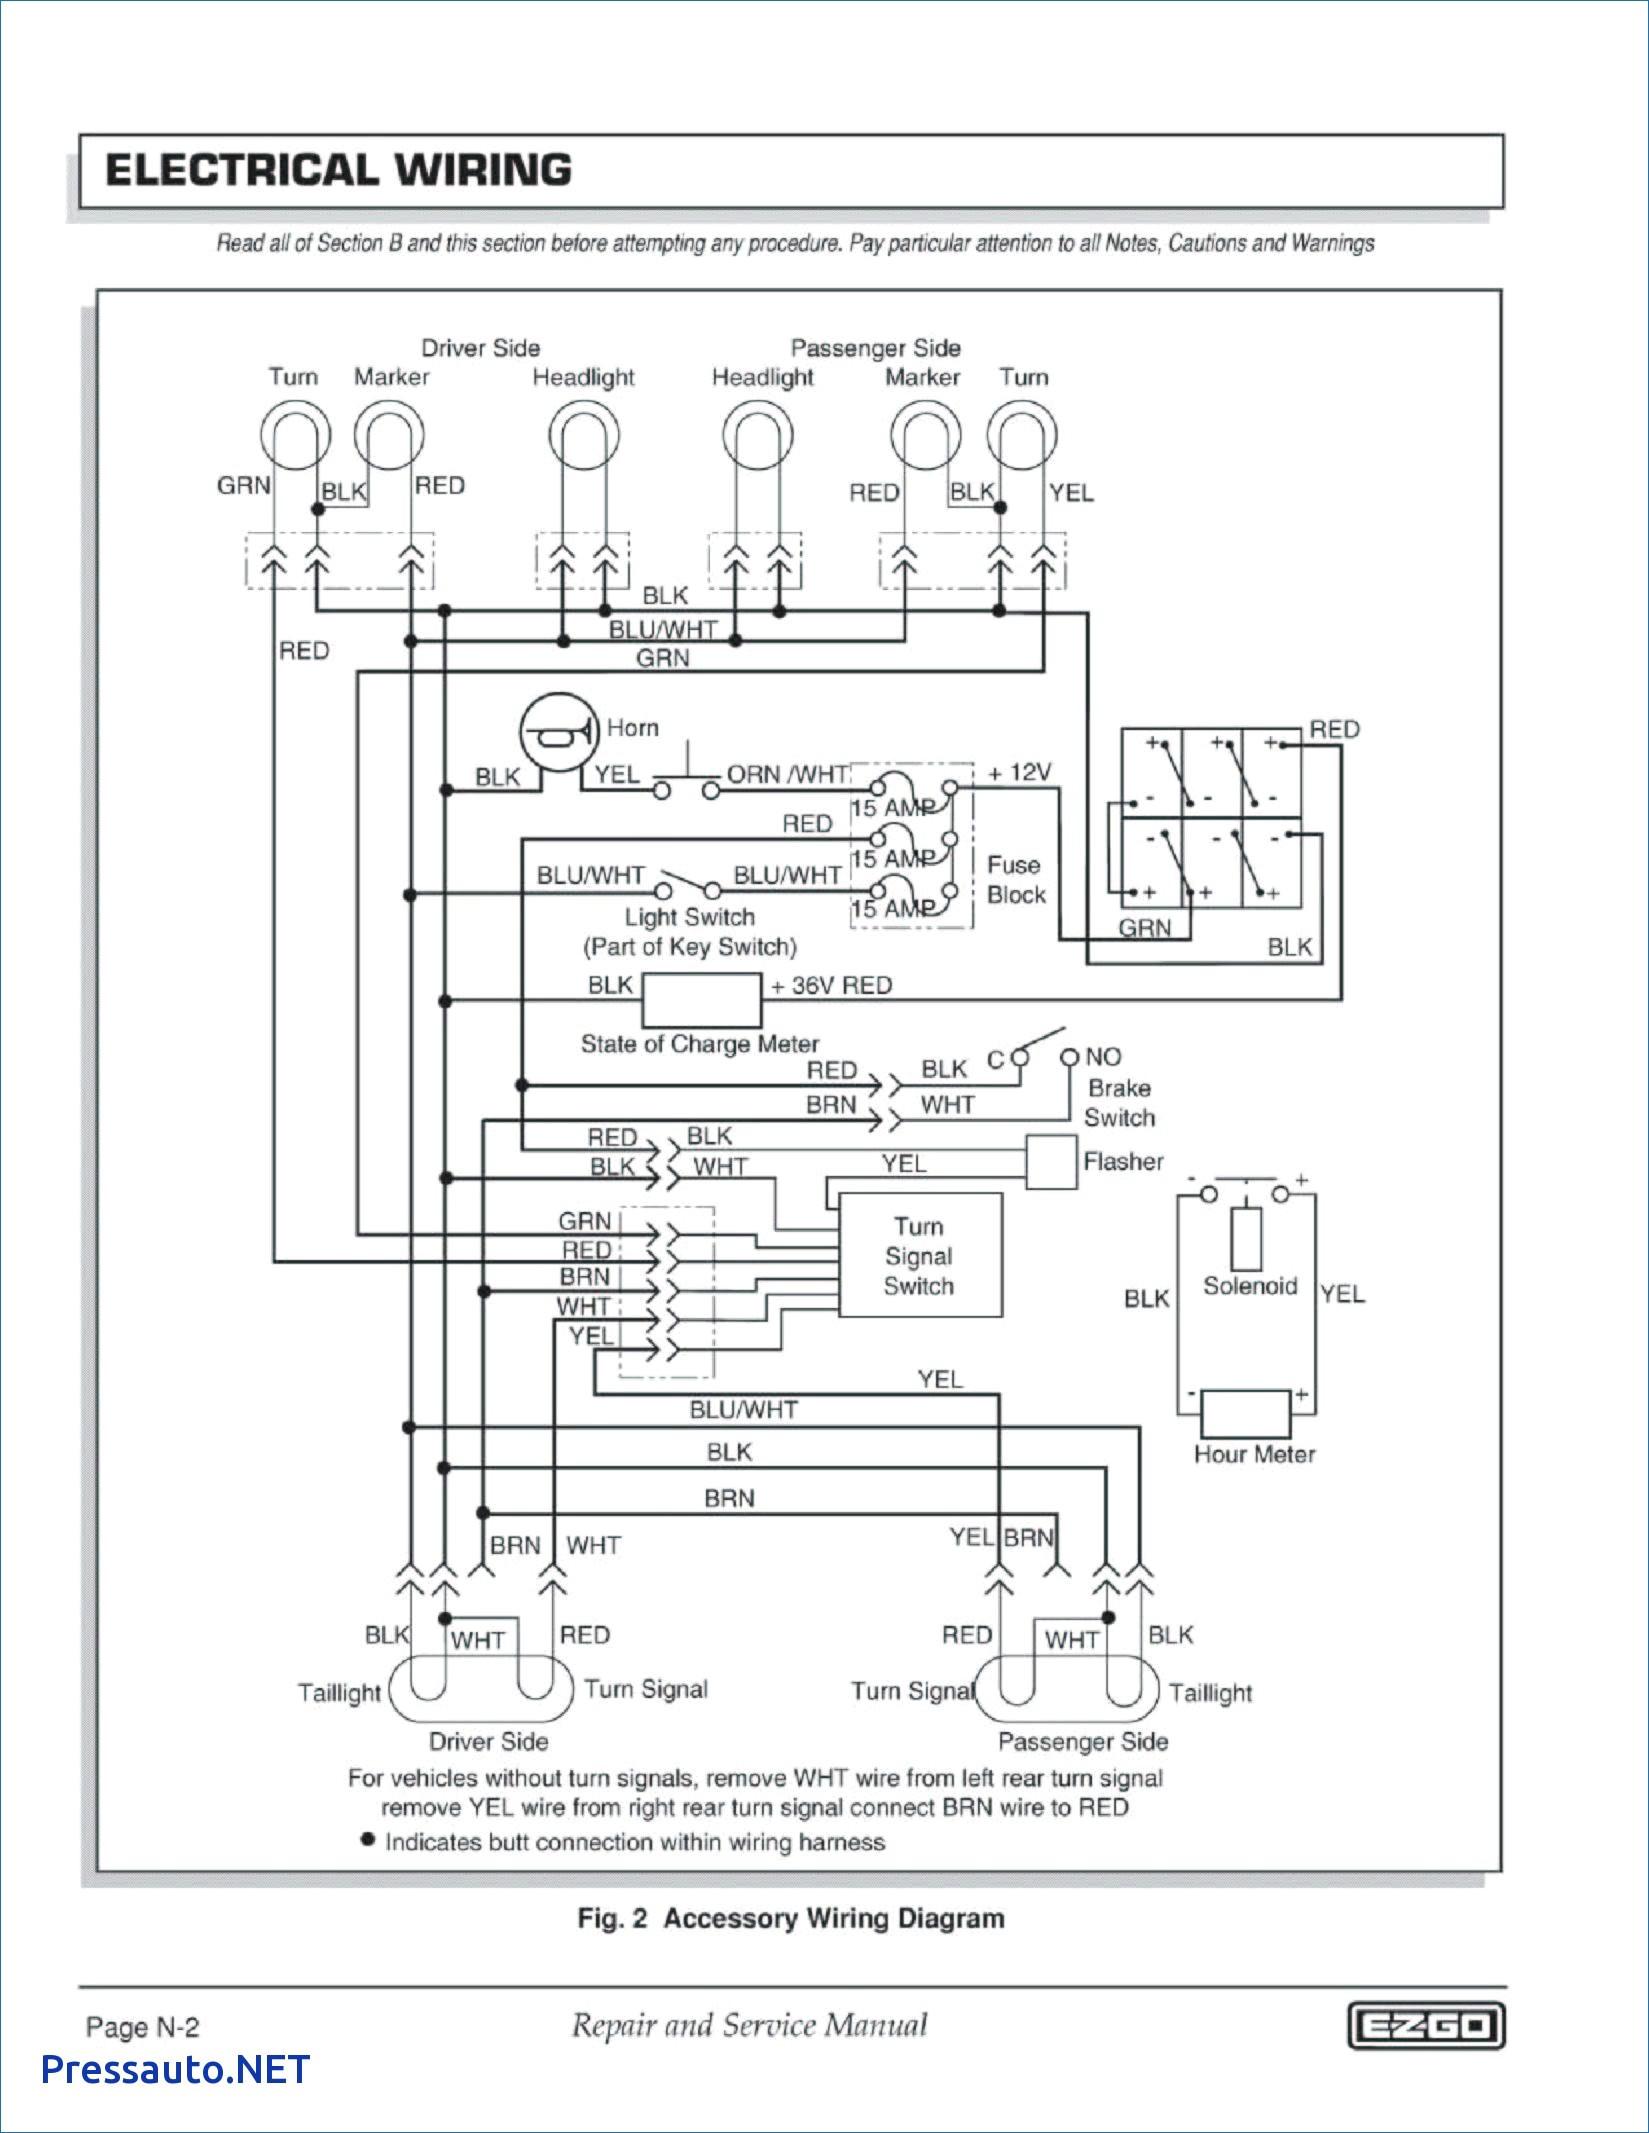 parts diagram for club car ezgo 48 volt wiring diagram of parts diagram for club  car